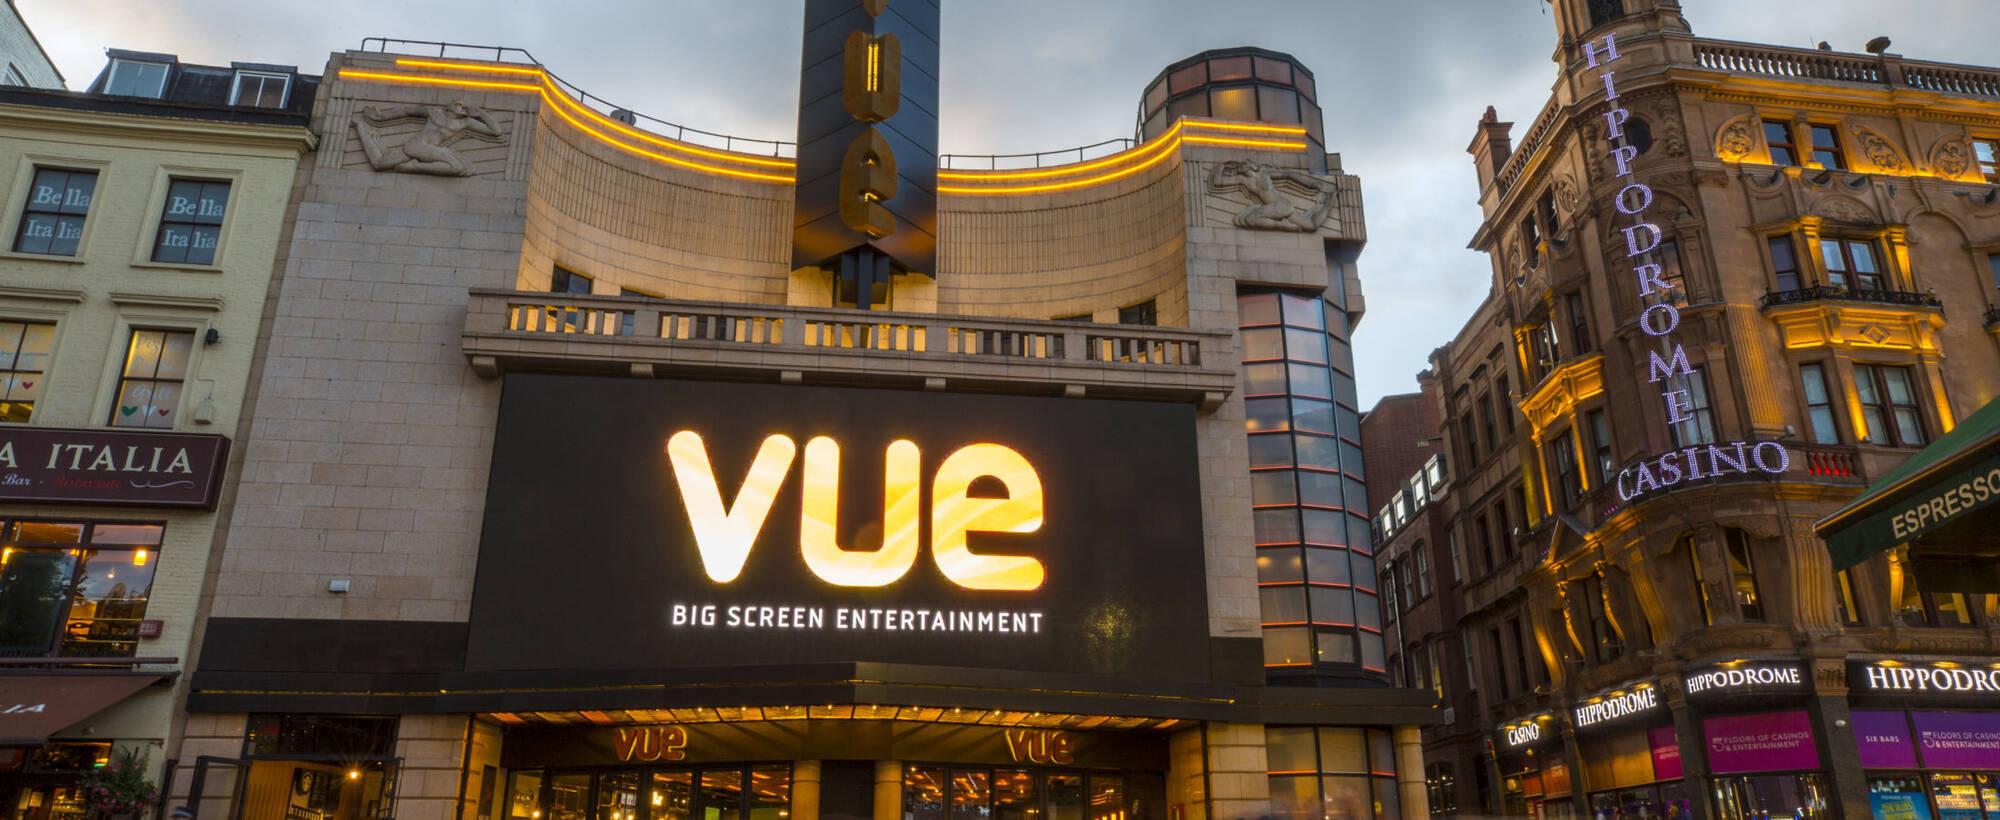 Vue Cinema G Vs001